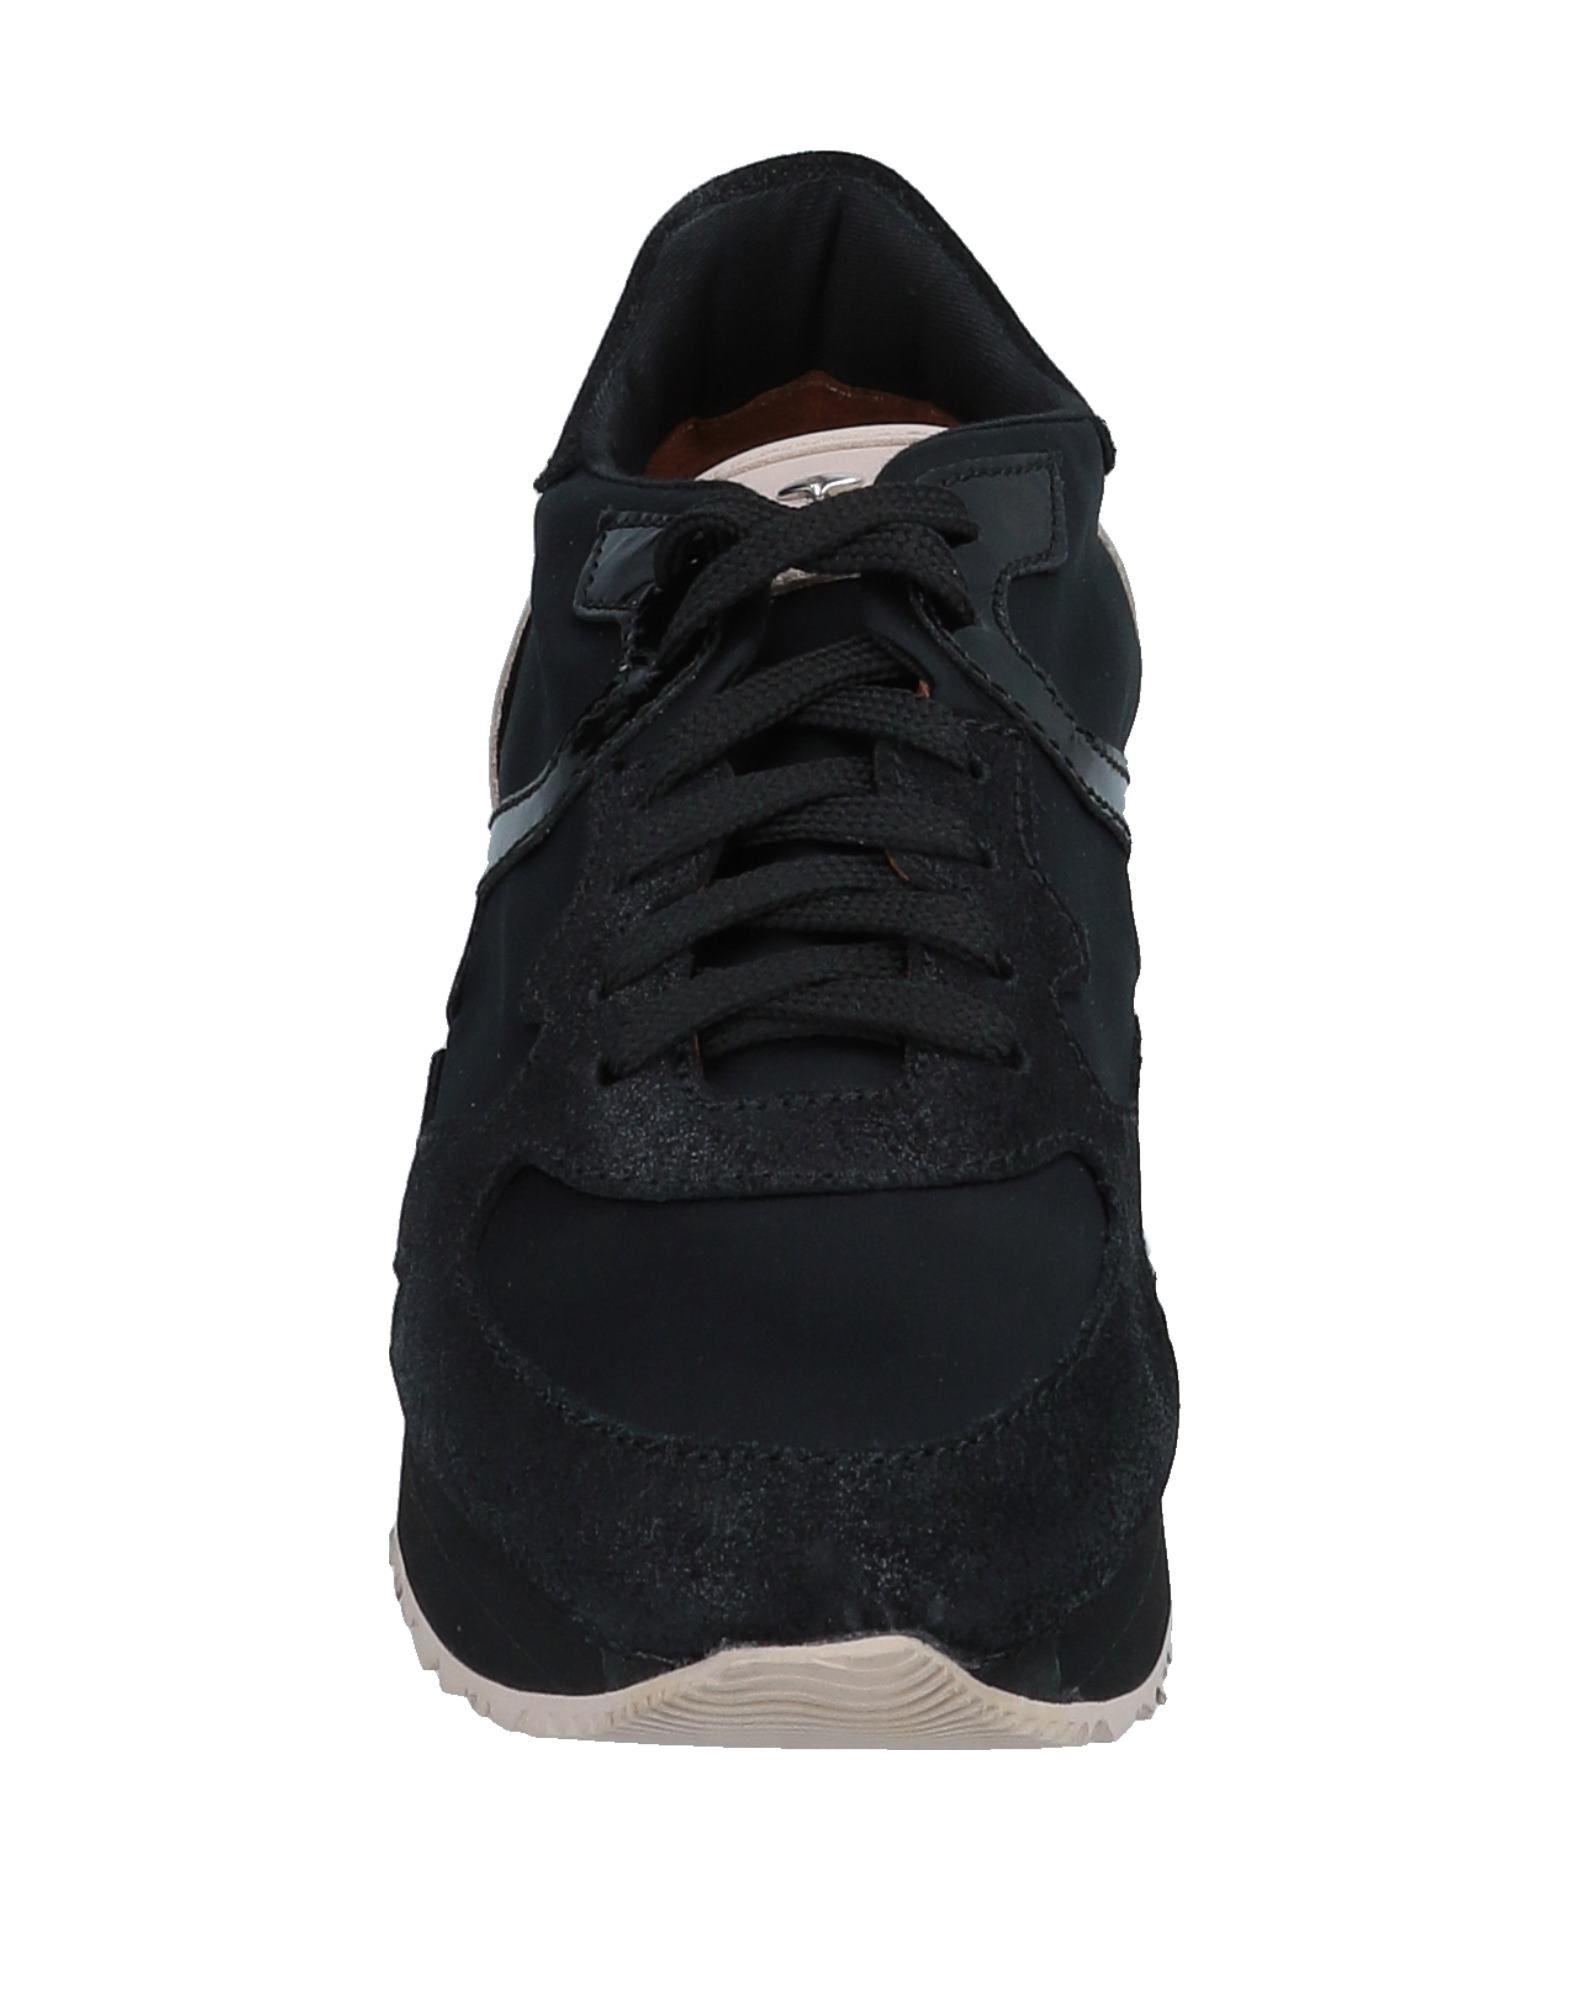 Stilvolle billige Damen Schuhe Alberto Guardiani Turnschuhes Damen billige 11568028EU 609a12